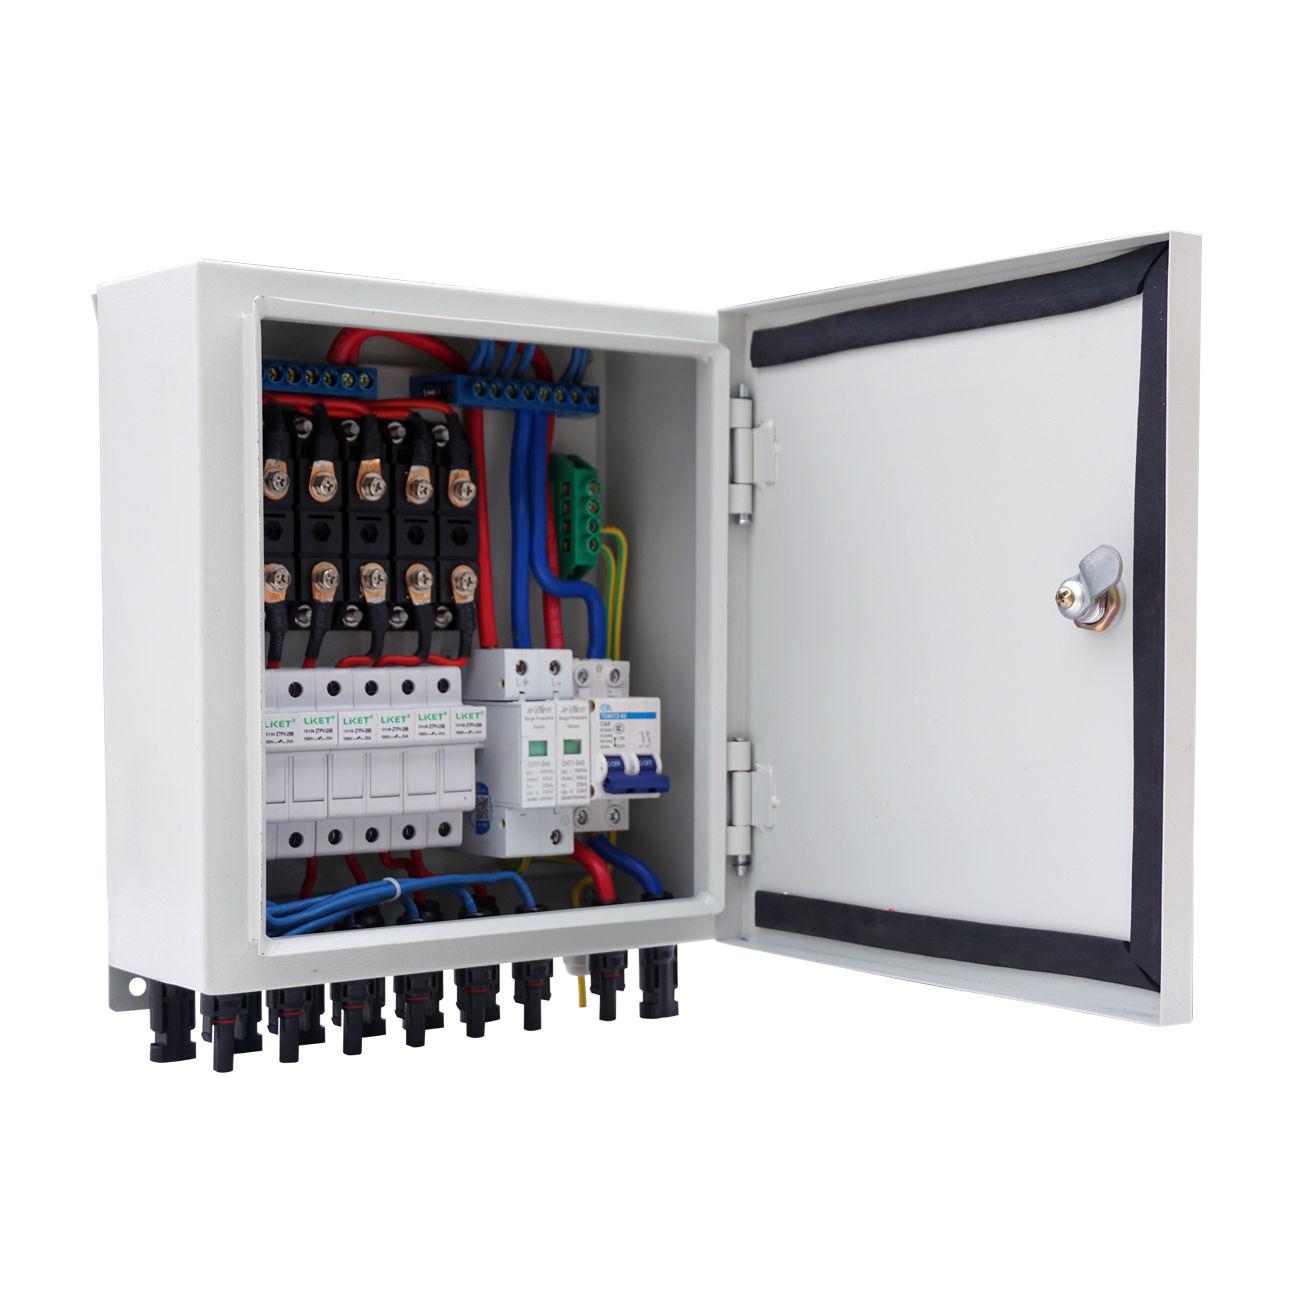 6 string solar pv combiner box w circuit breakers surge ae wiring diagram [ 1300 x 1300 Pixel ]